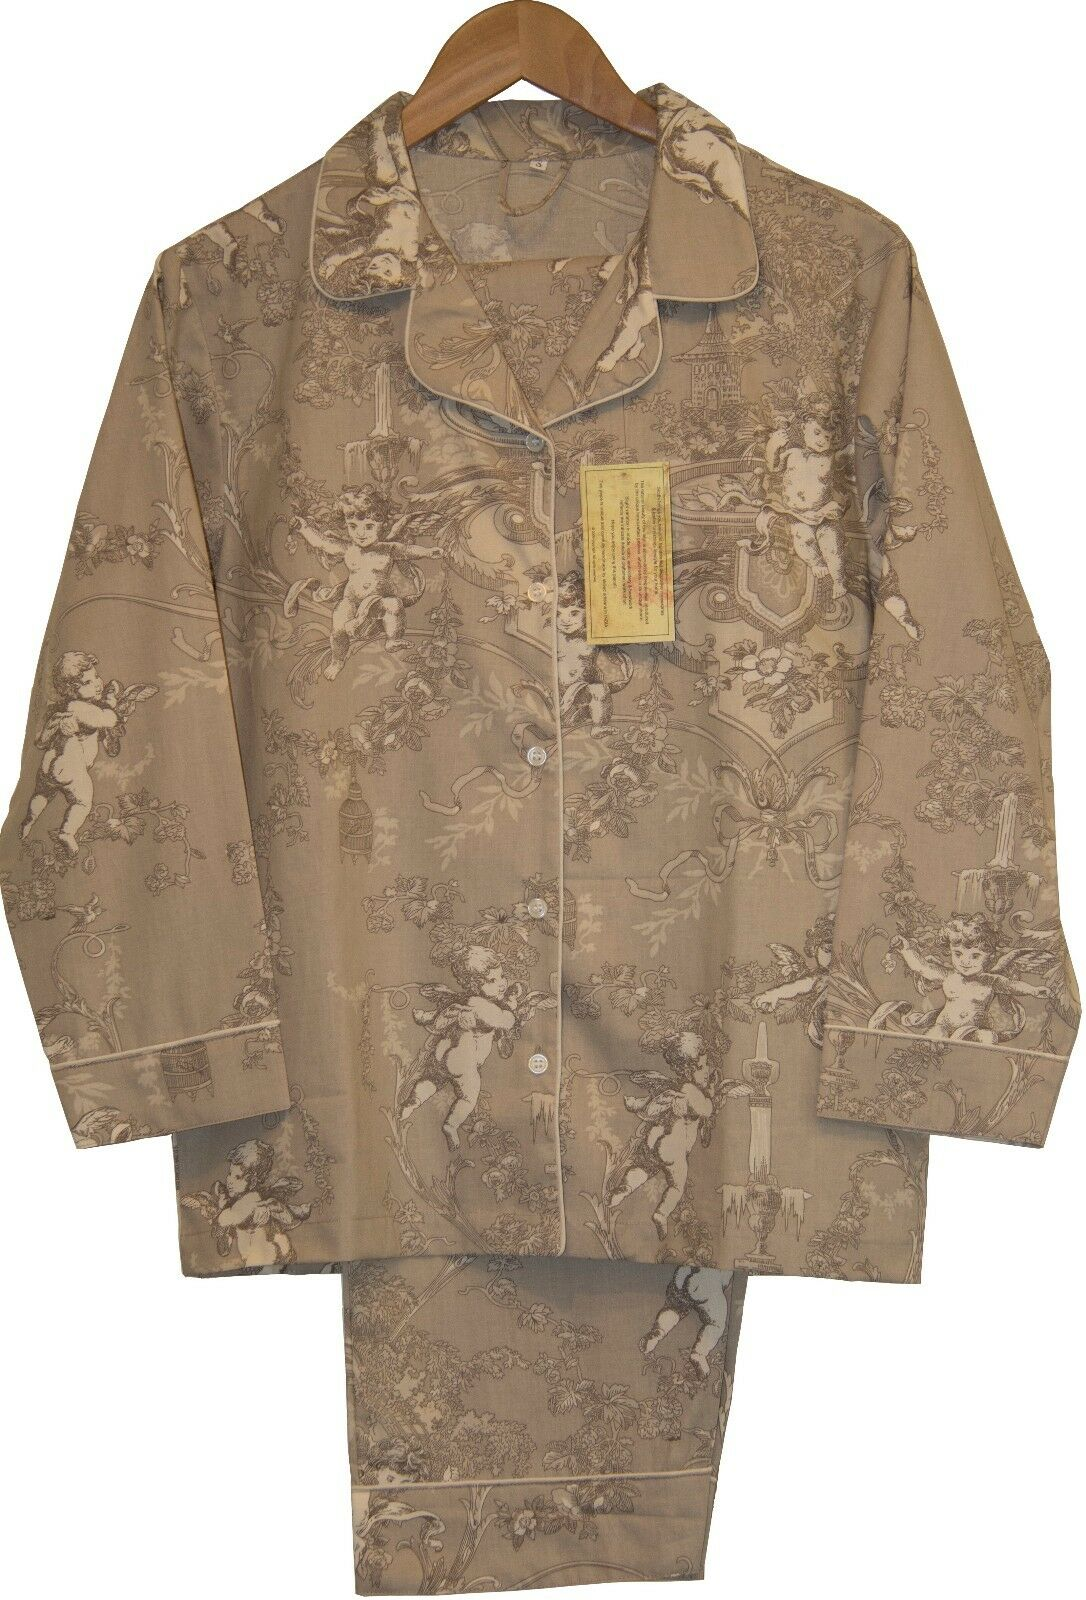 Cherubs Beige  100% Cotton Women's Pajamas